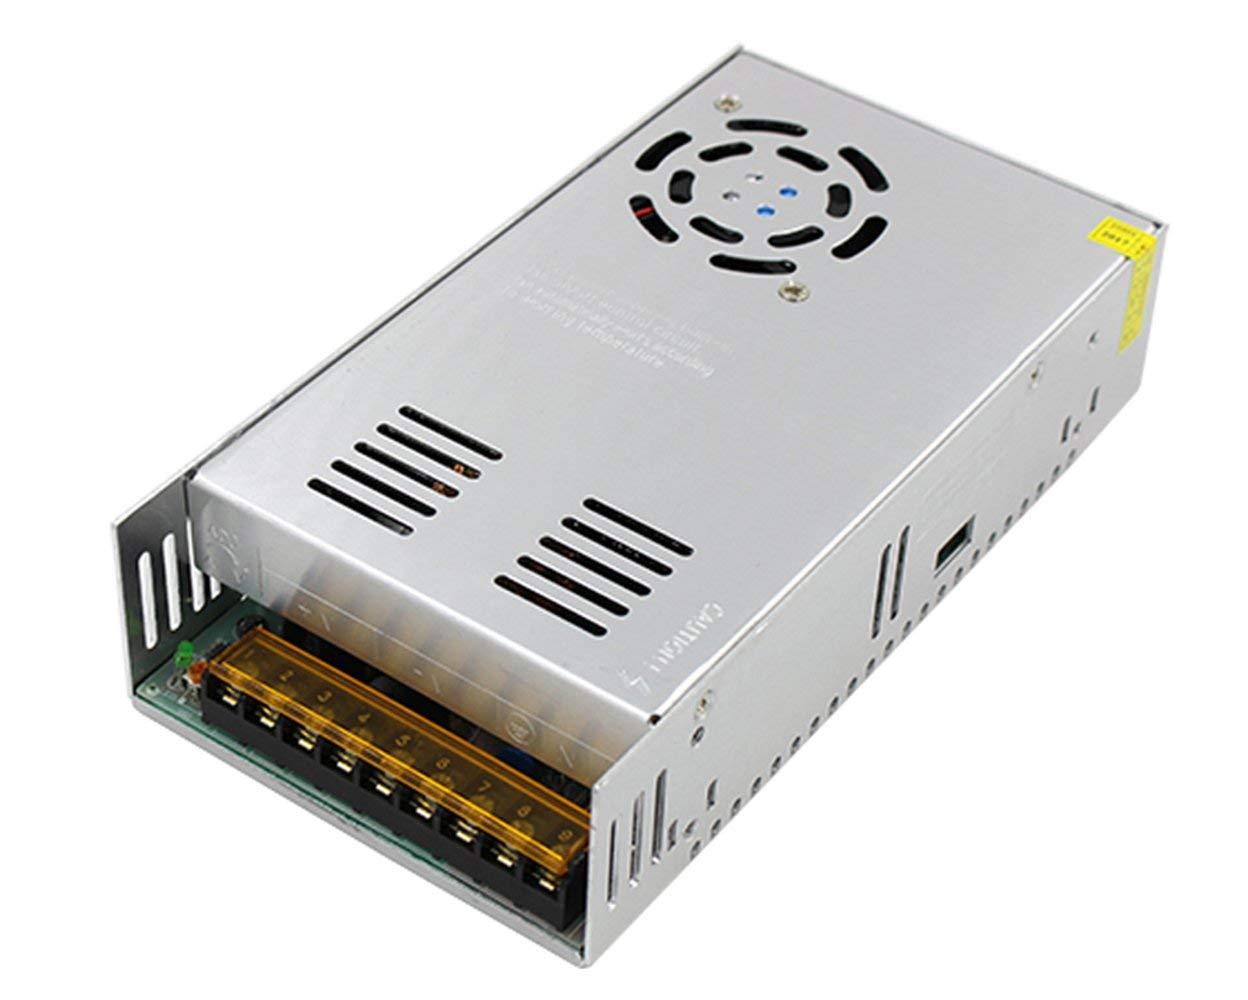 12V 29A 350W Switching Power Supply Driver for CCTV camera LED Strip AC 100-240V Input to DC 12V